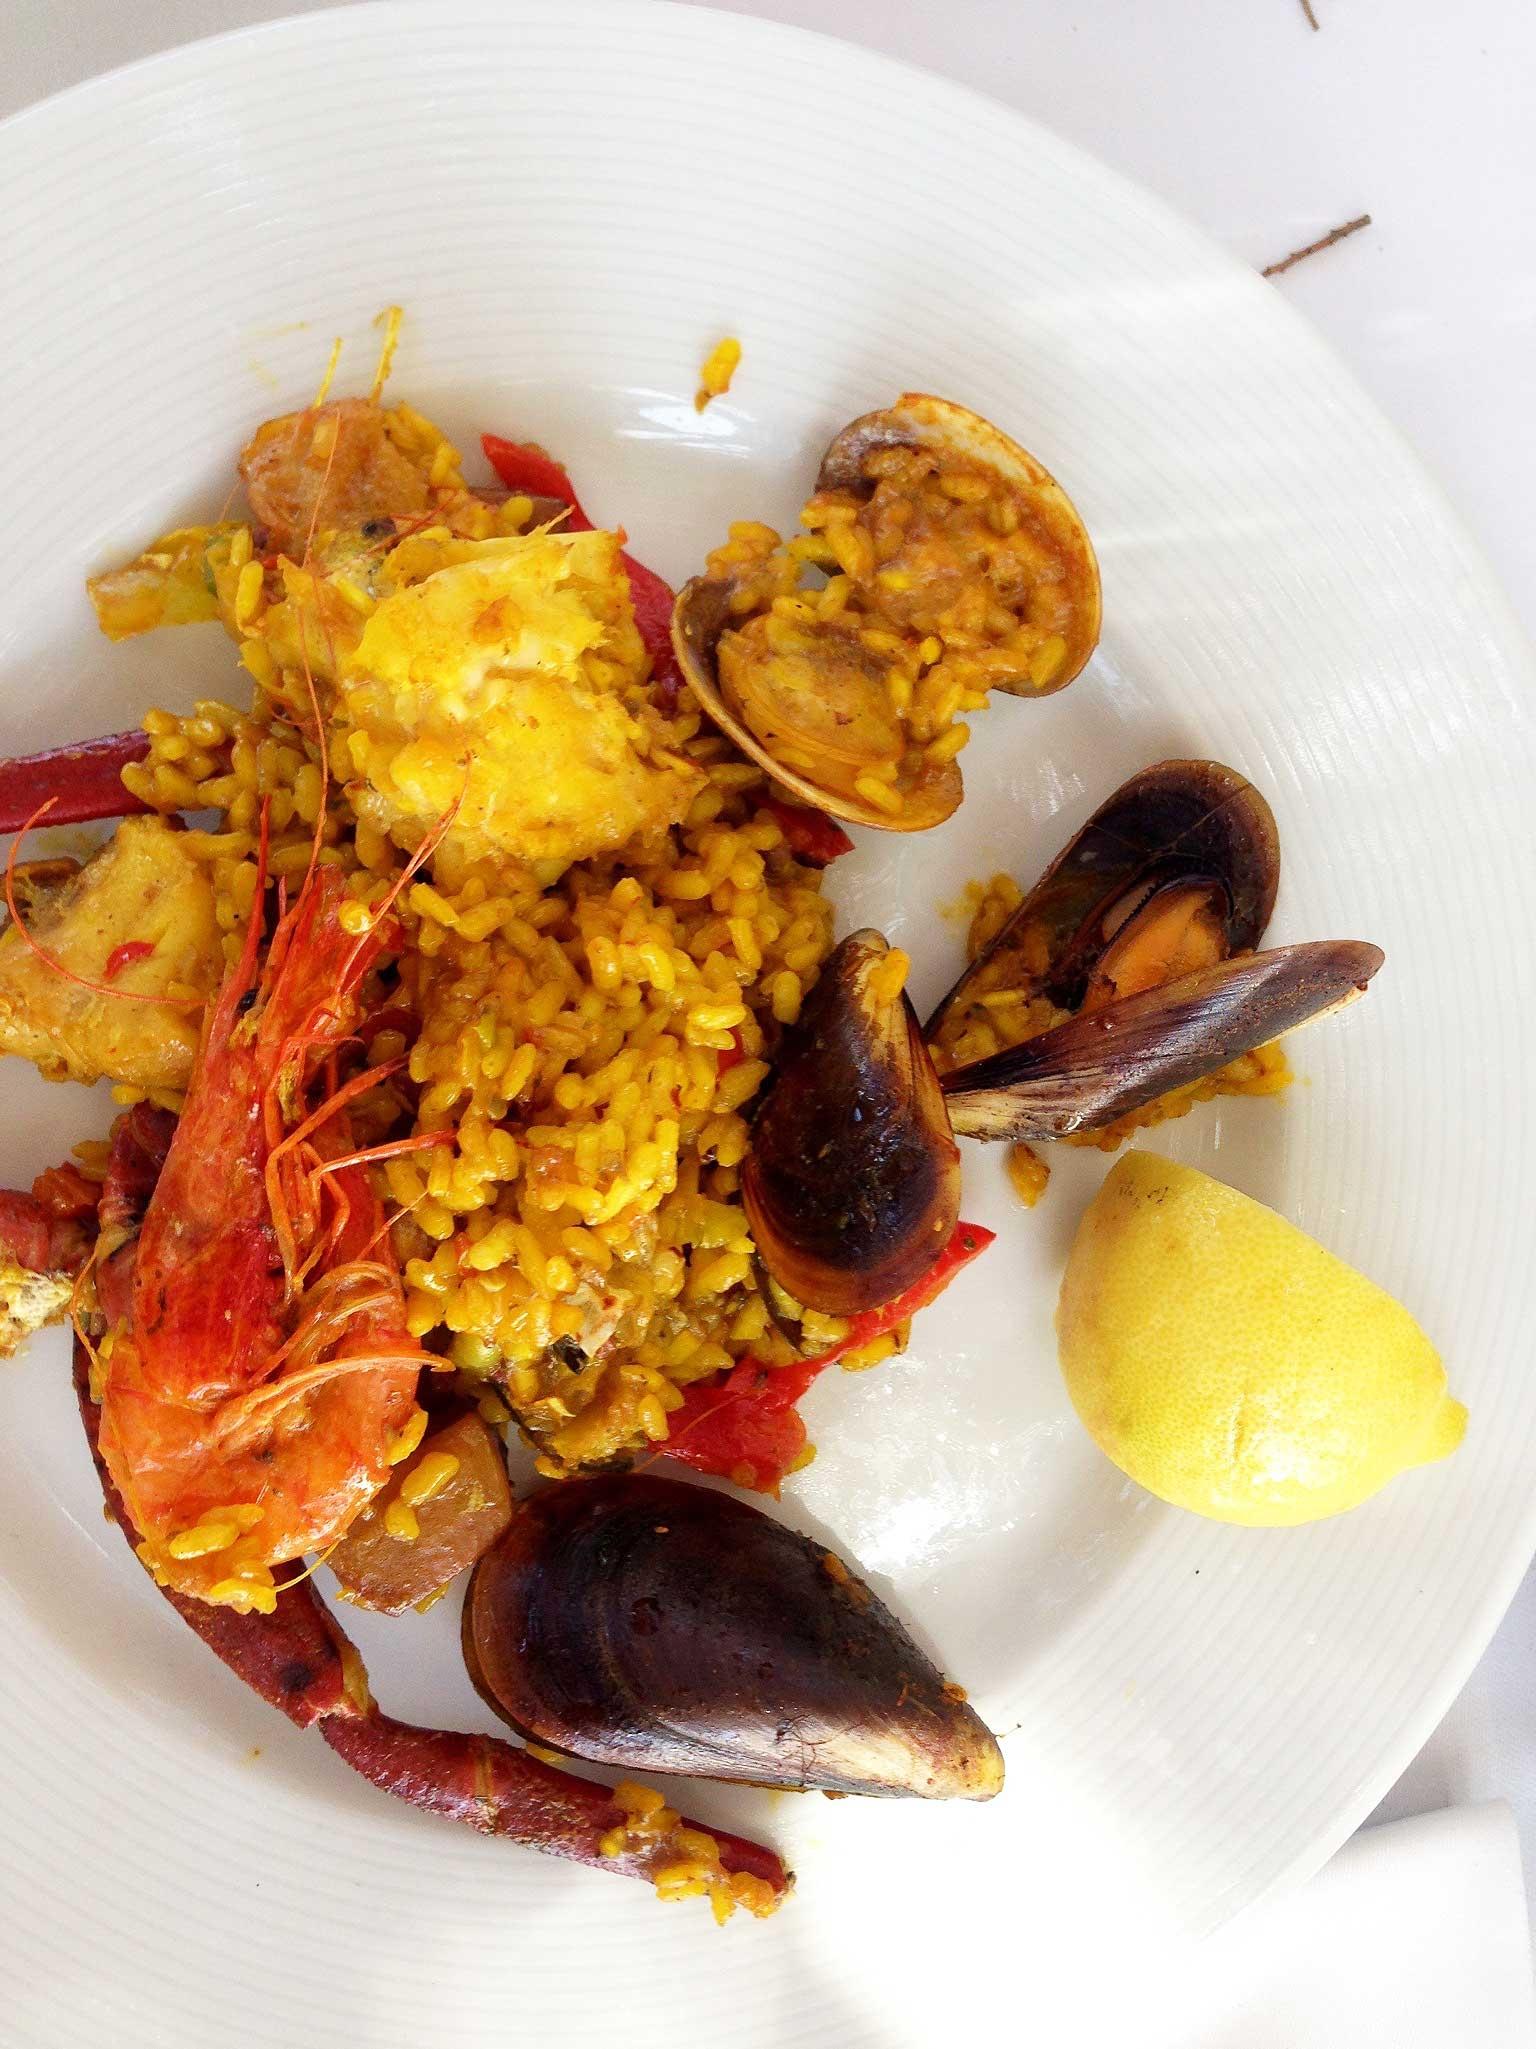 The seafood paella at restaurant, Es Torrent